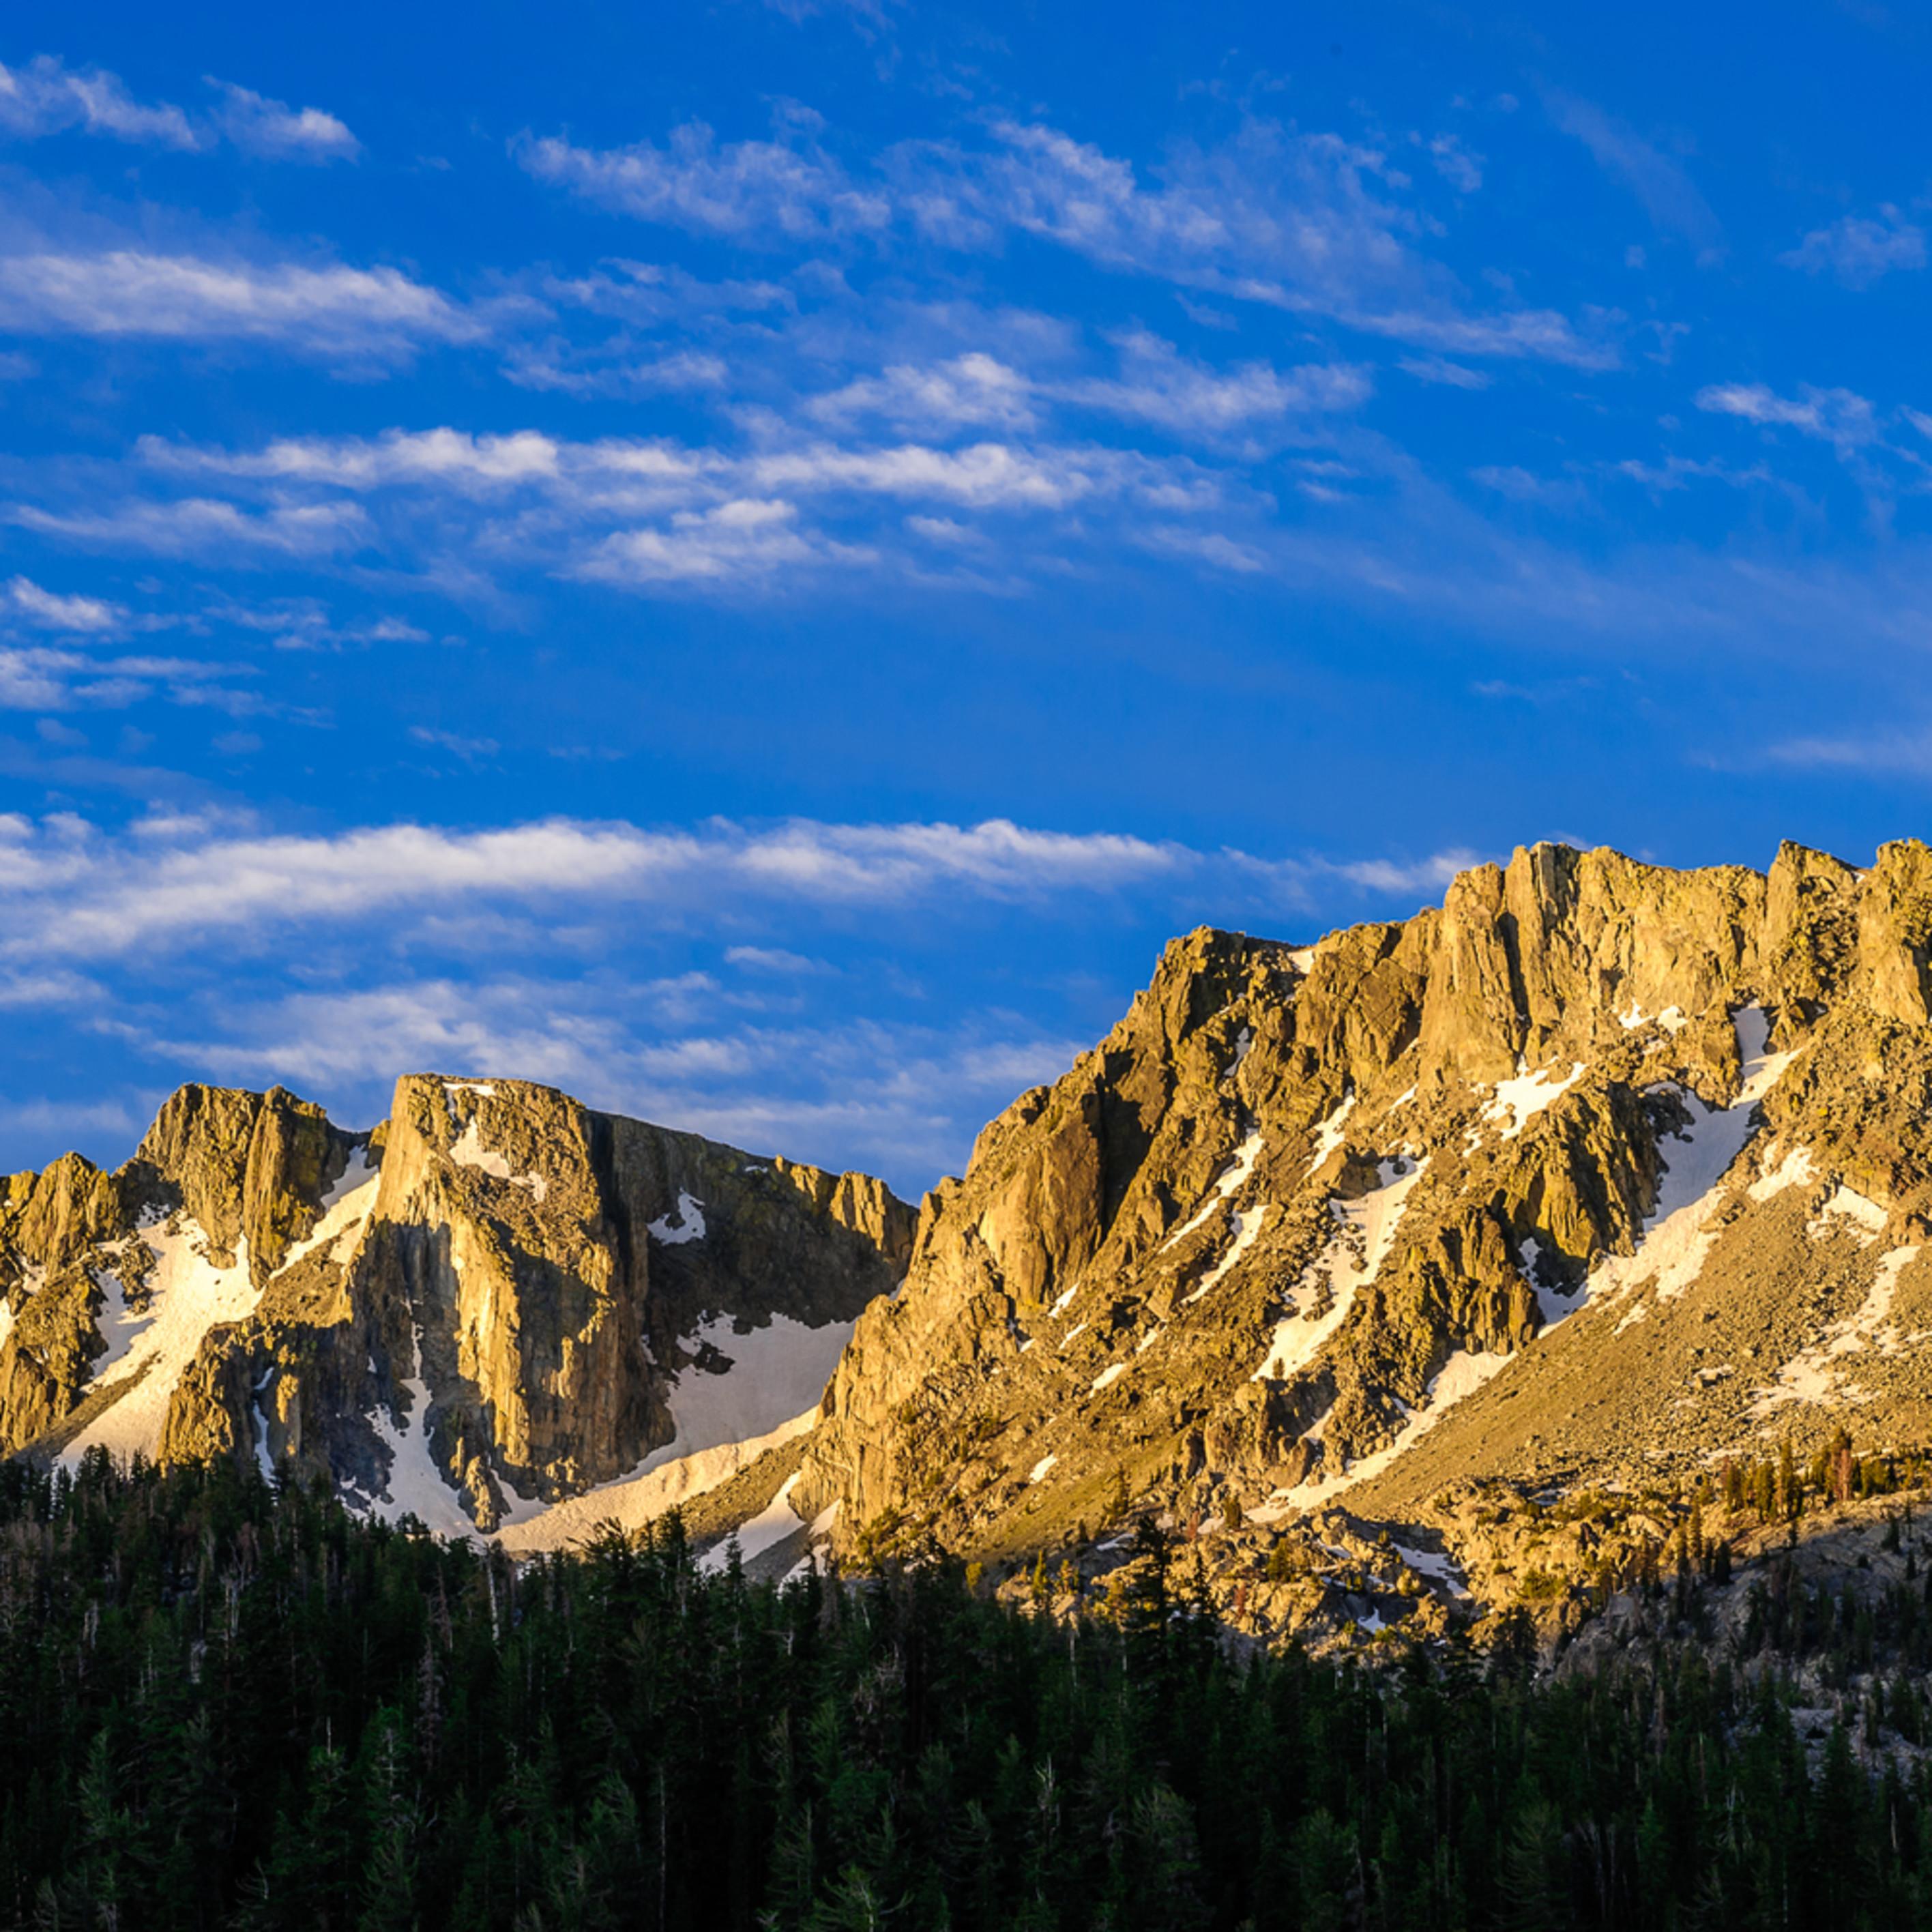 Sunrise mammoth crest california 2016 urncgm